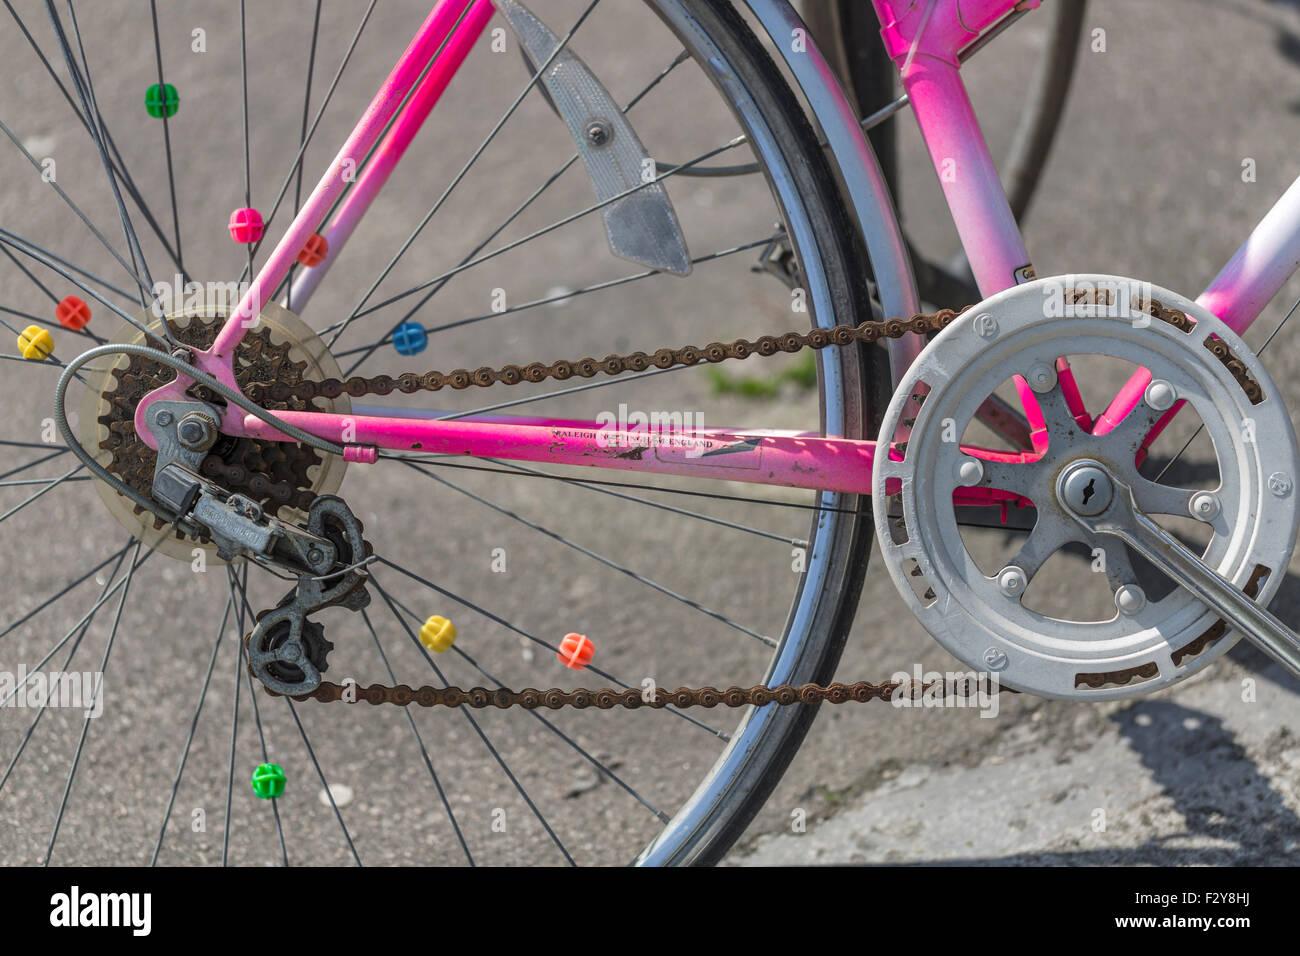 Detalle de una vieja bicicleta oxidada Foto de stock